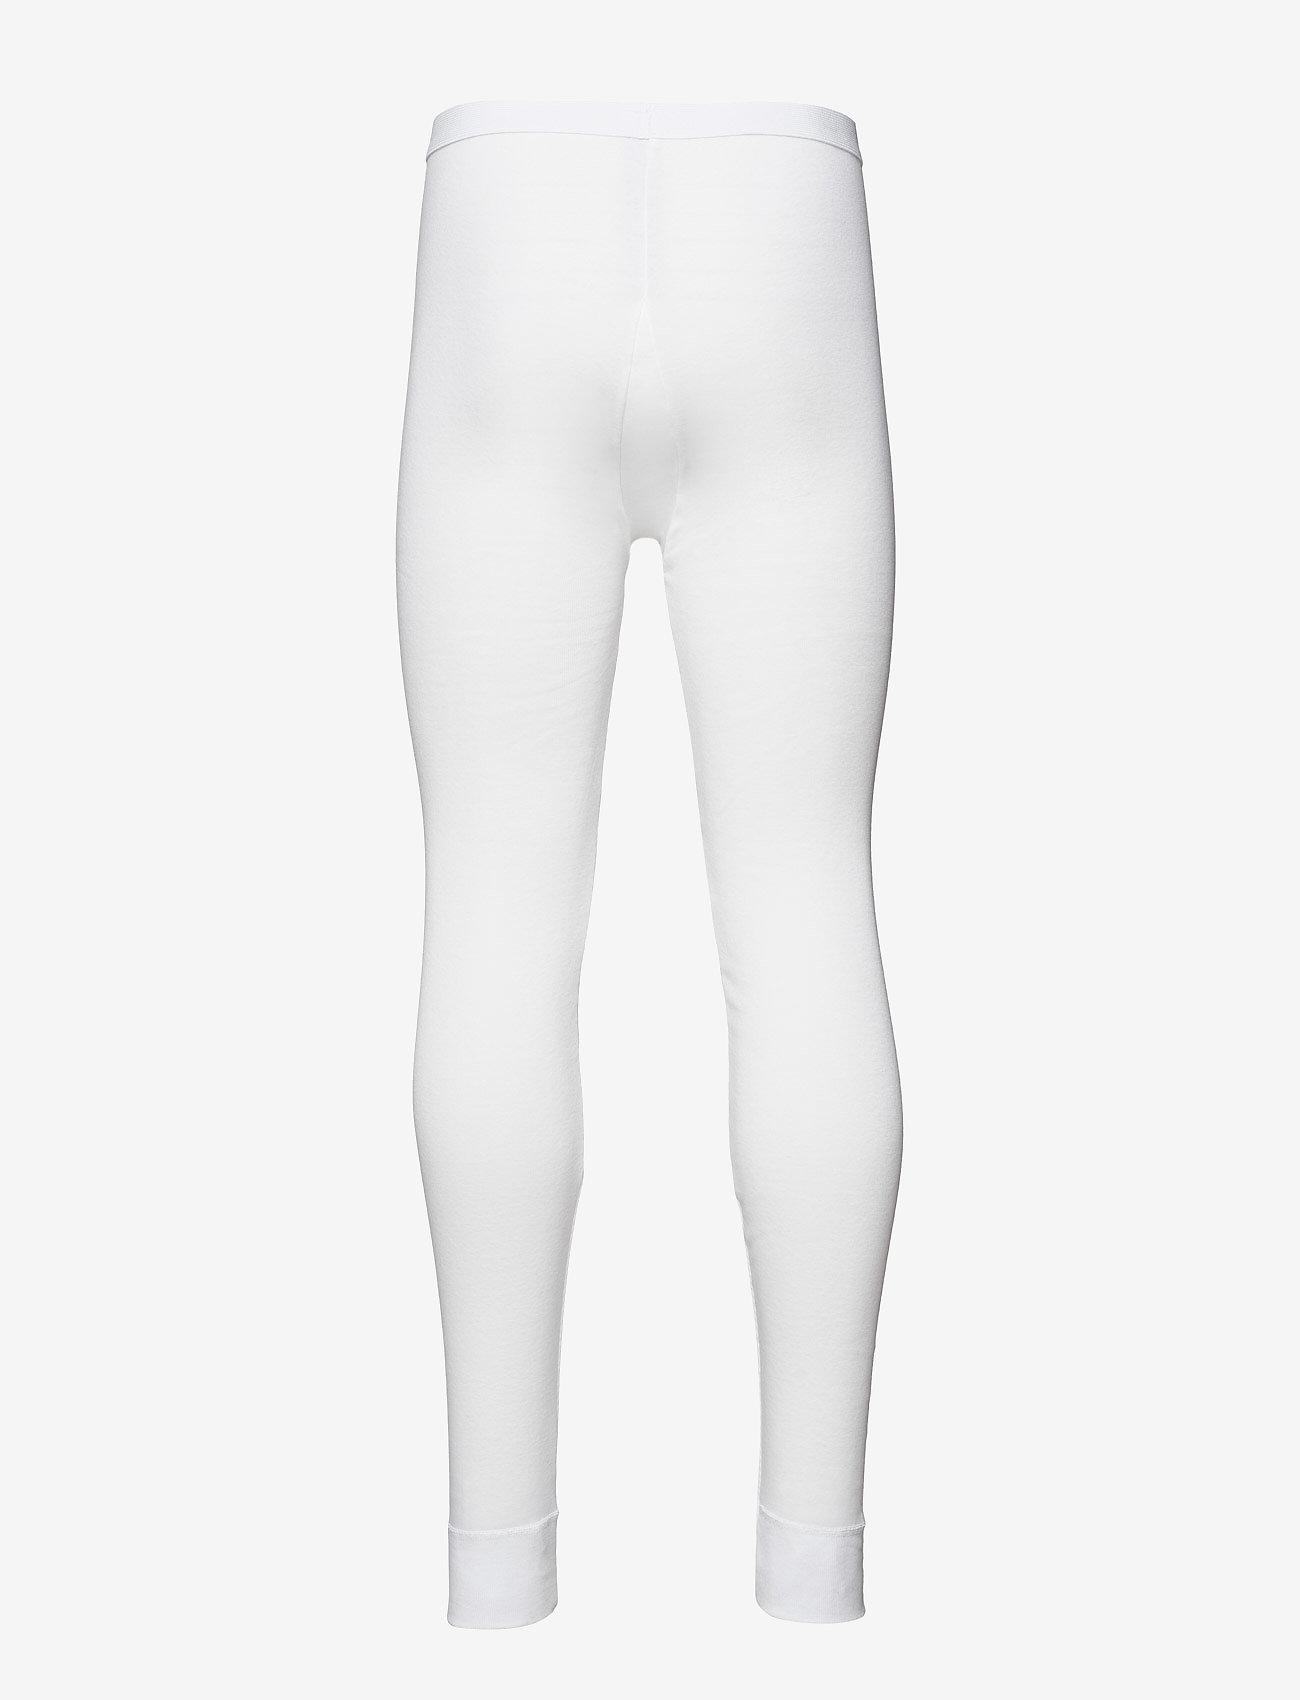 JBS - Original long legs - base layer bottoms - white - 1